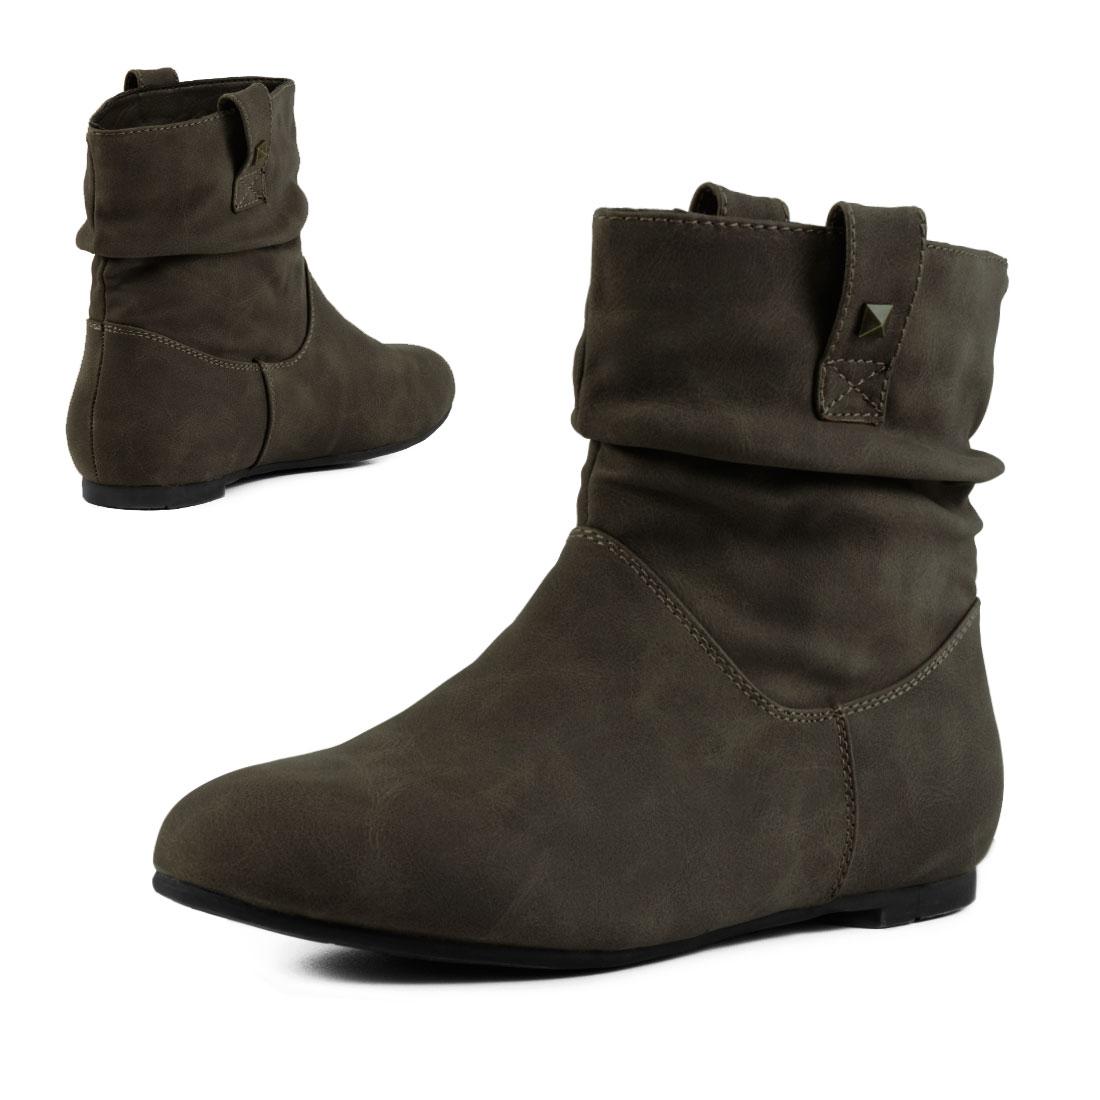 neu damen schlupf stiefel basic boots schuhe gr e 36 37 38 39 40 41 ebay. Black Bedroom Furniture Sets. Home Design Ideas